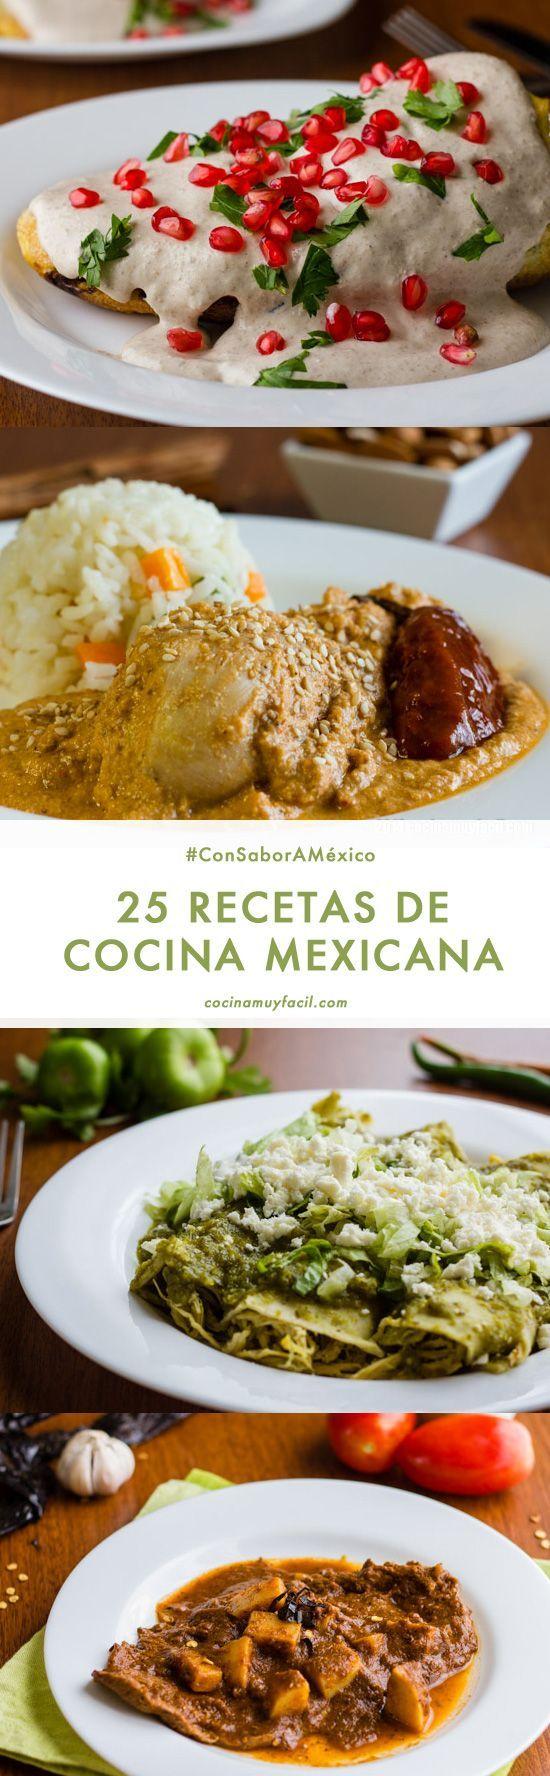 25 best images about comida mexicana on pinterest caldo for Cocina tradicional